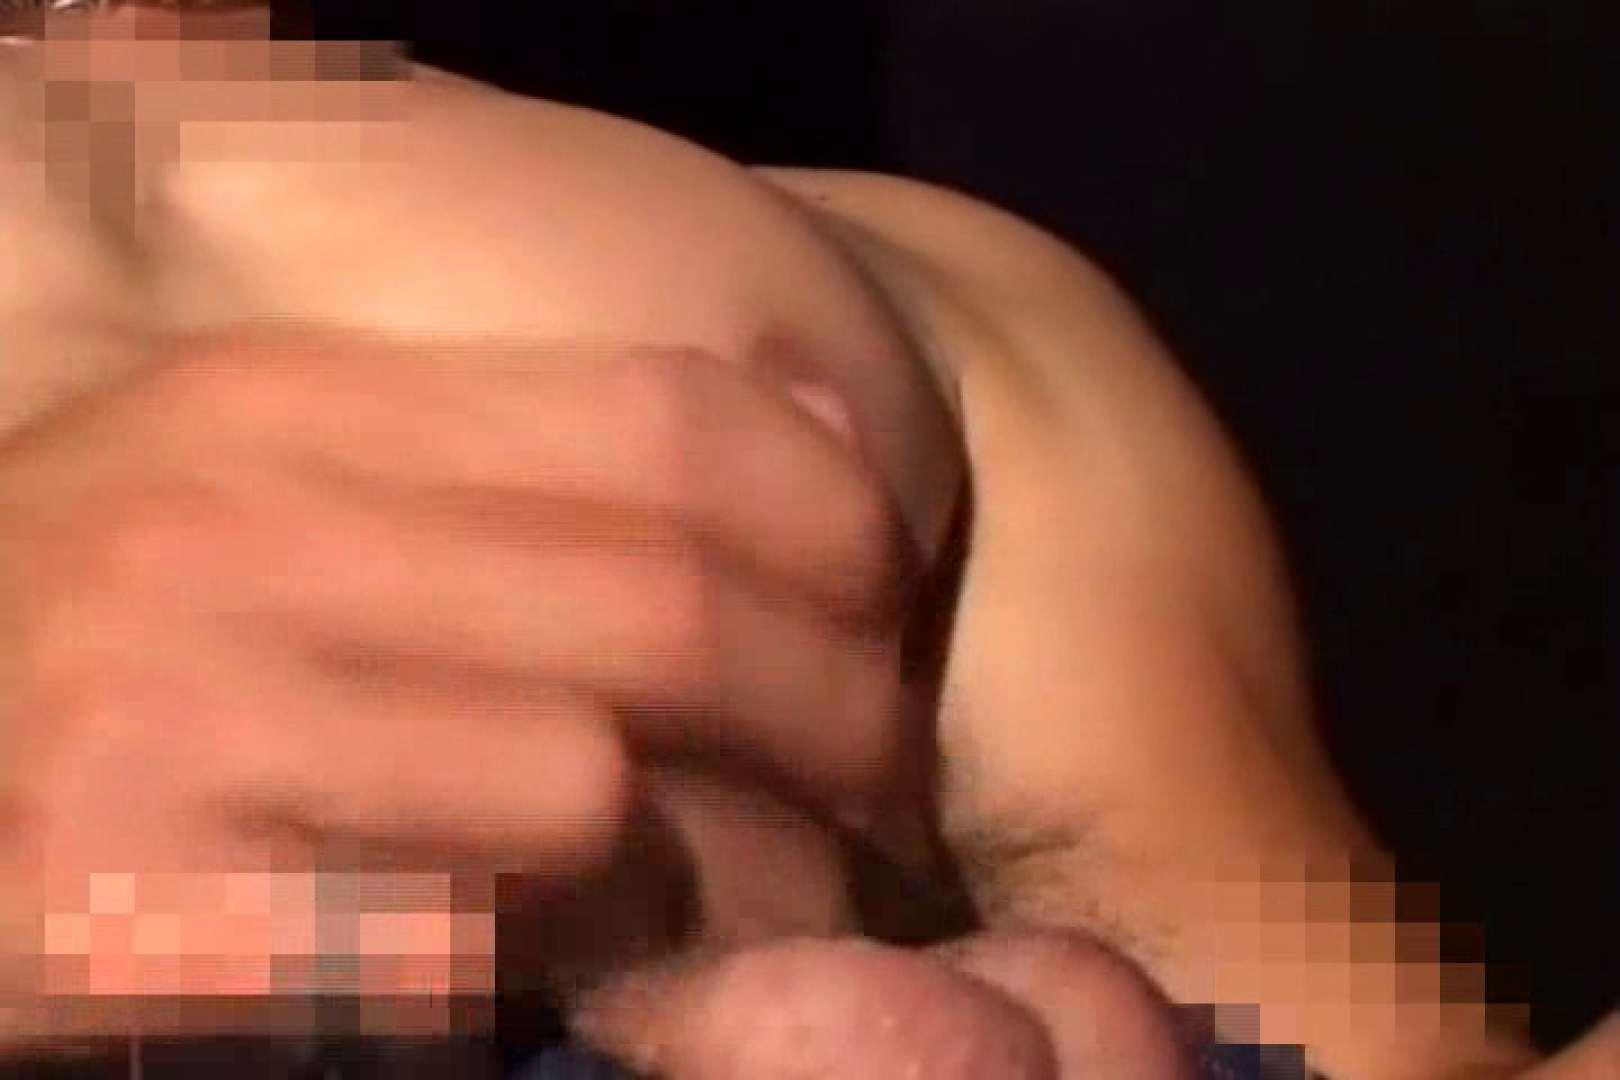 Beautiful muscle モッコリ野郎達!Vol.04 フェラDE絶頂 | イケメンのsex  103pic 37